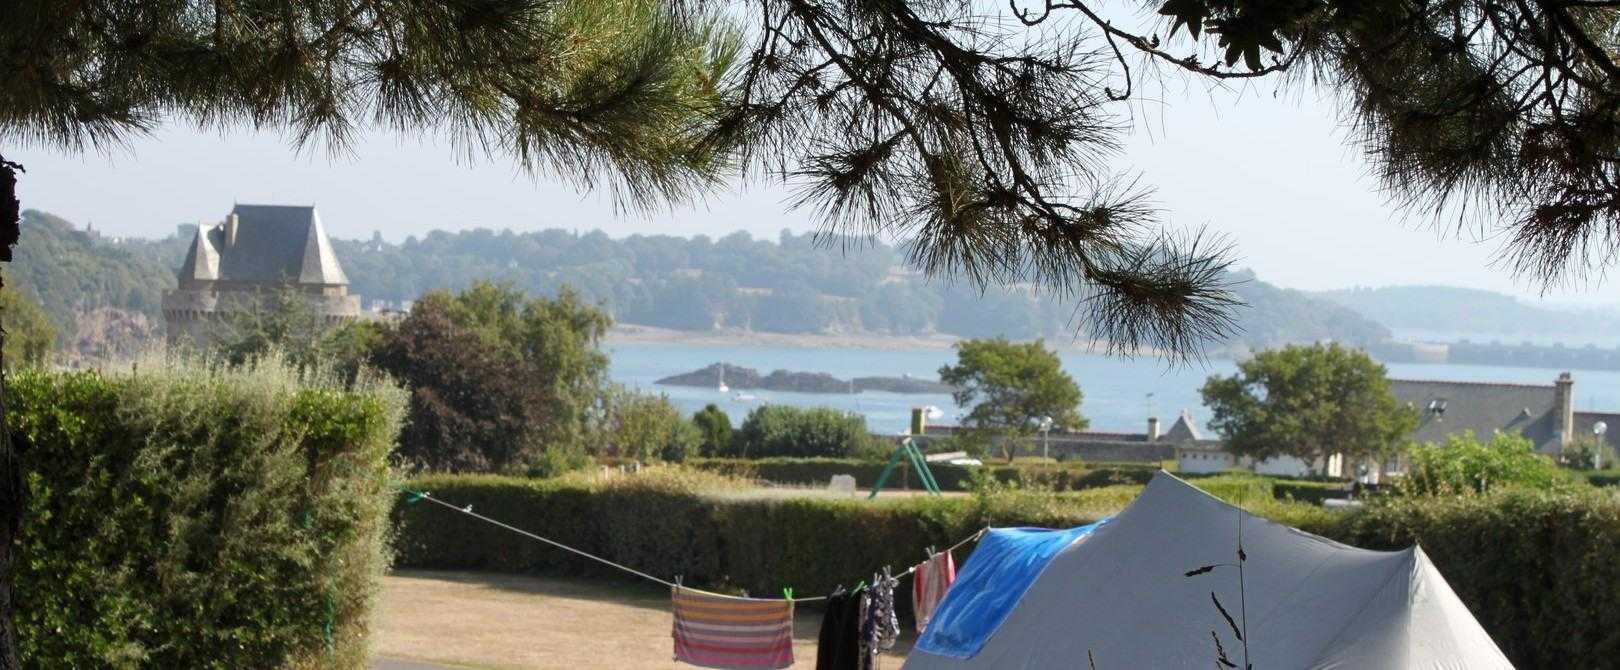 Camping saint malo avec piscine piscine d tente st malo for Camping saint malo avec piscine